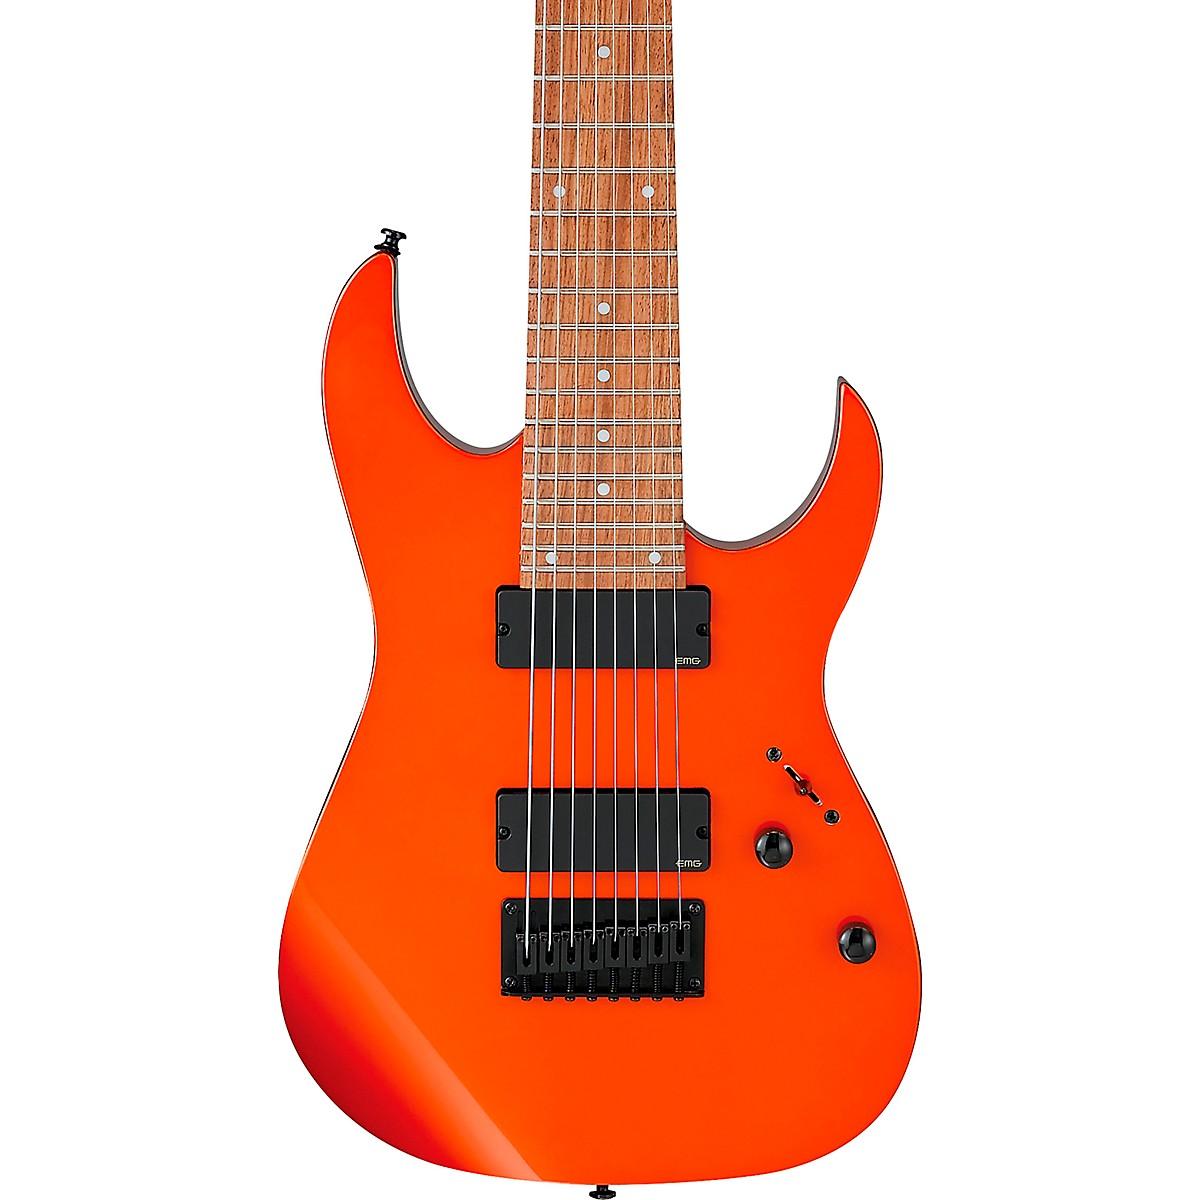 Ibanez RG80E 8-String Electric Guitar